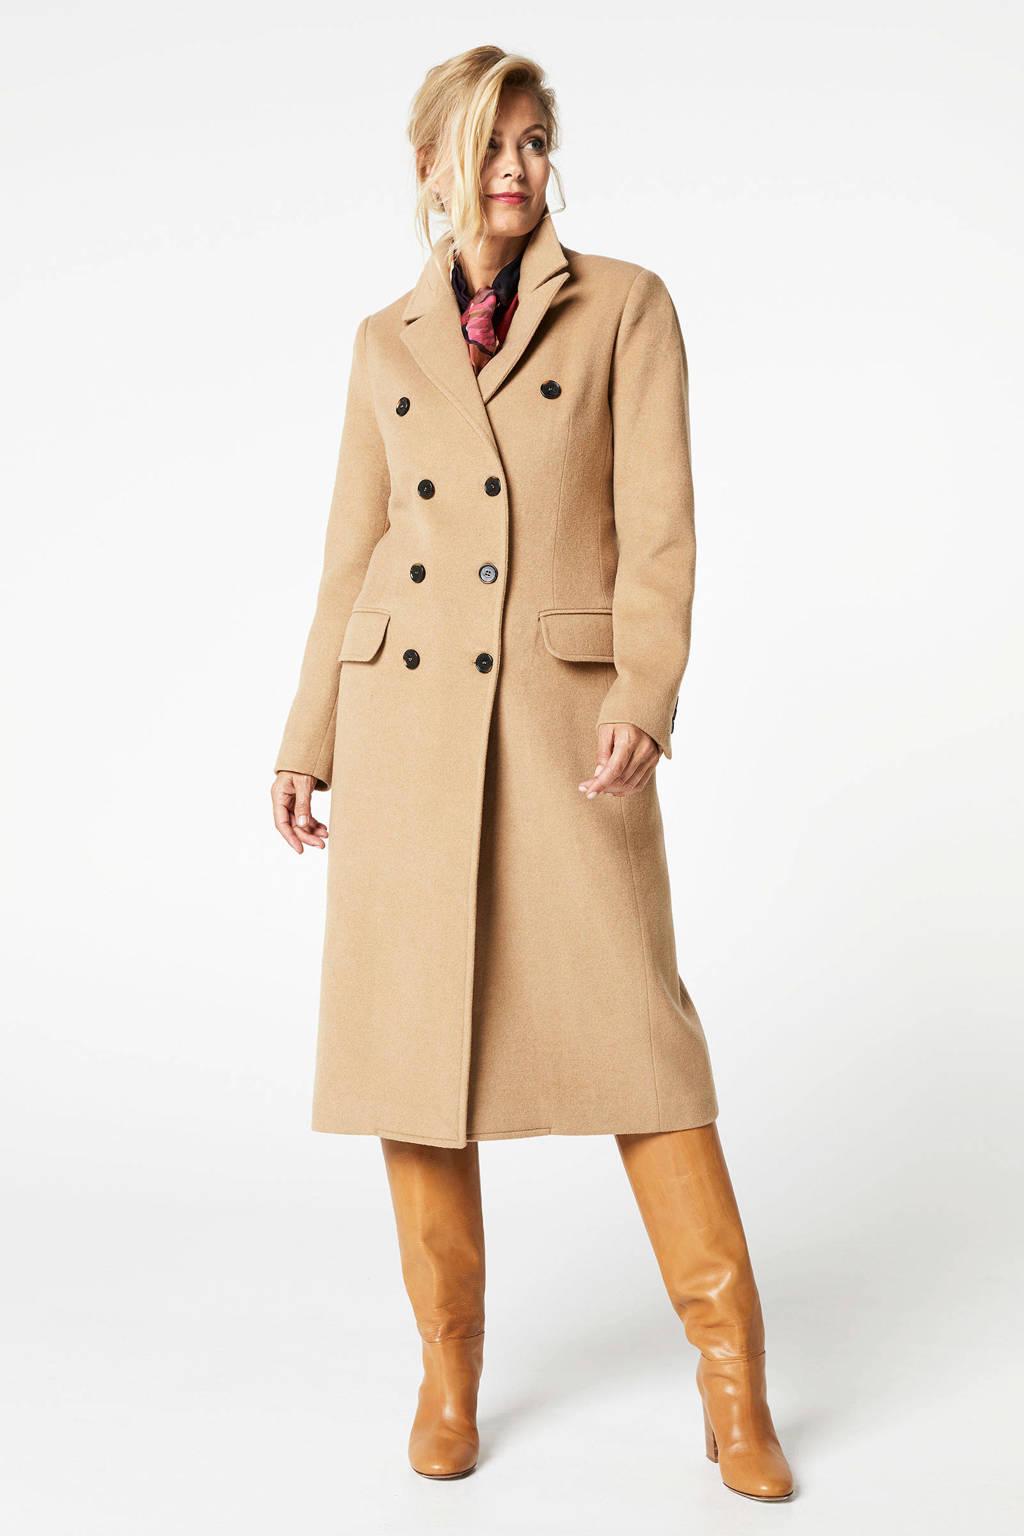 PROMISS coat met wol camel, Camel